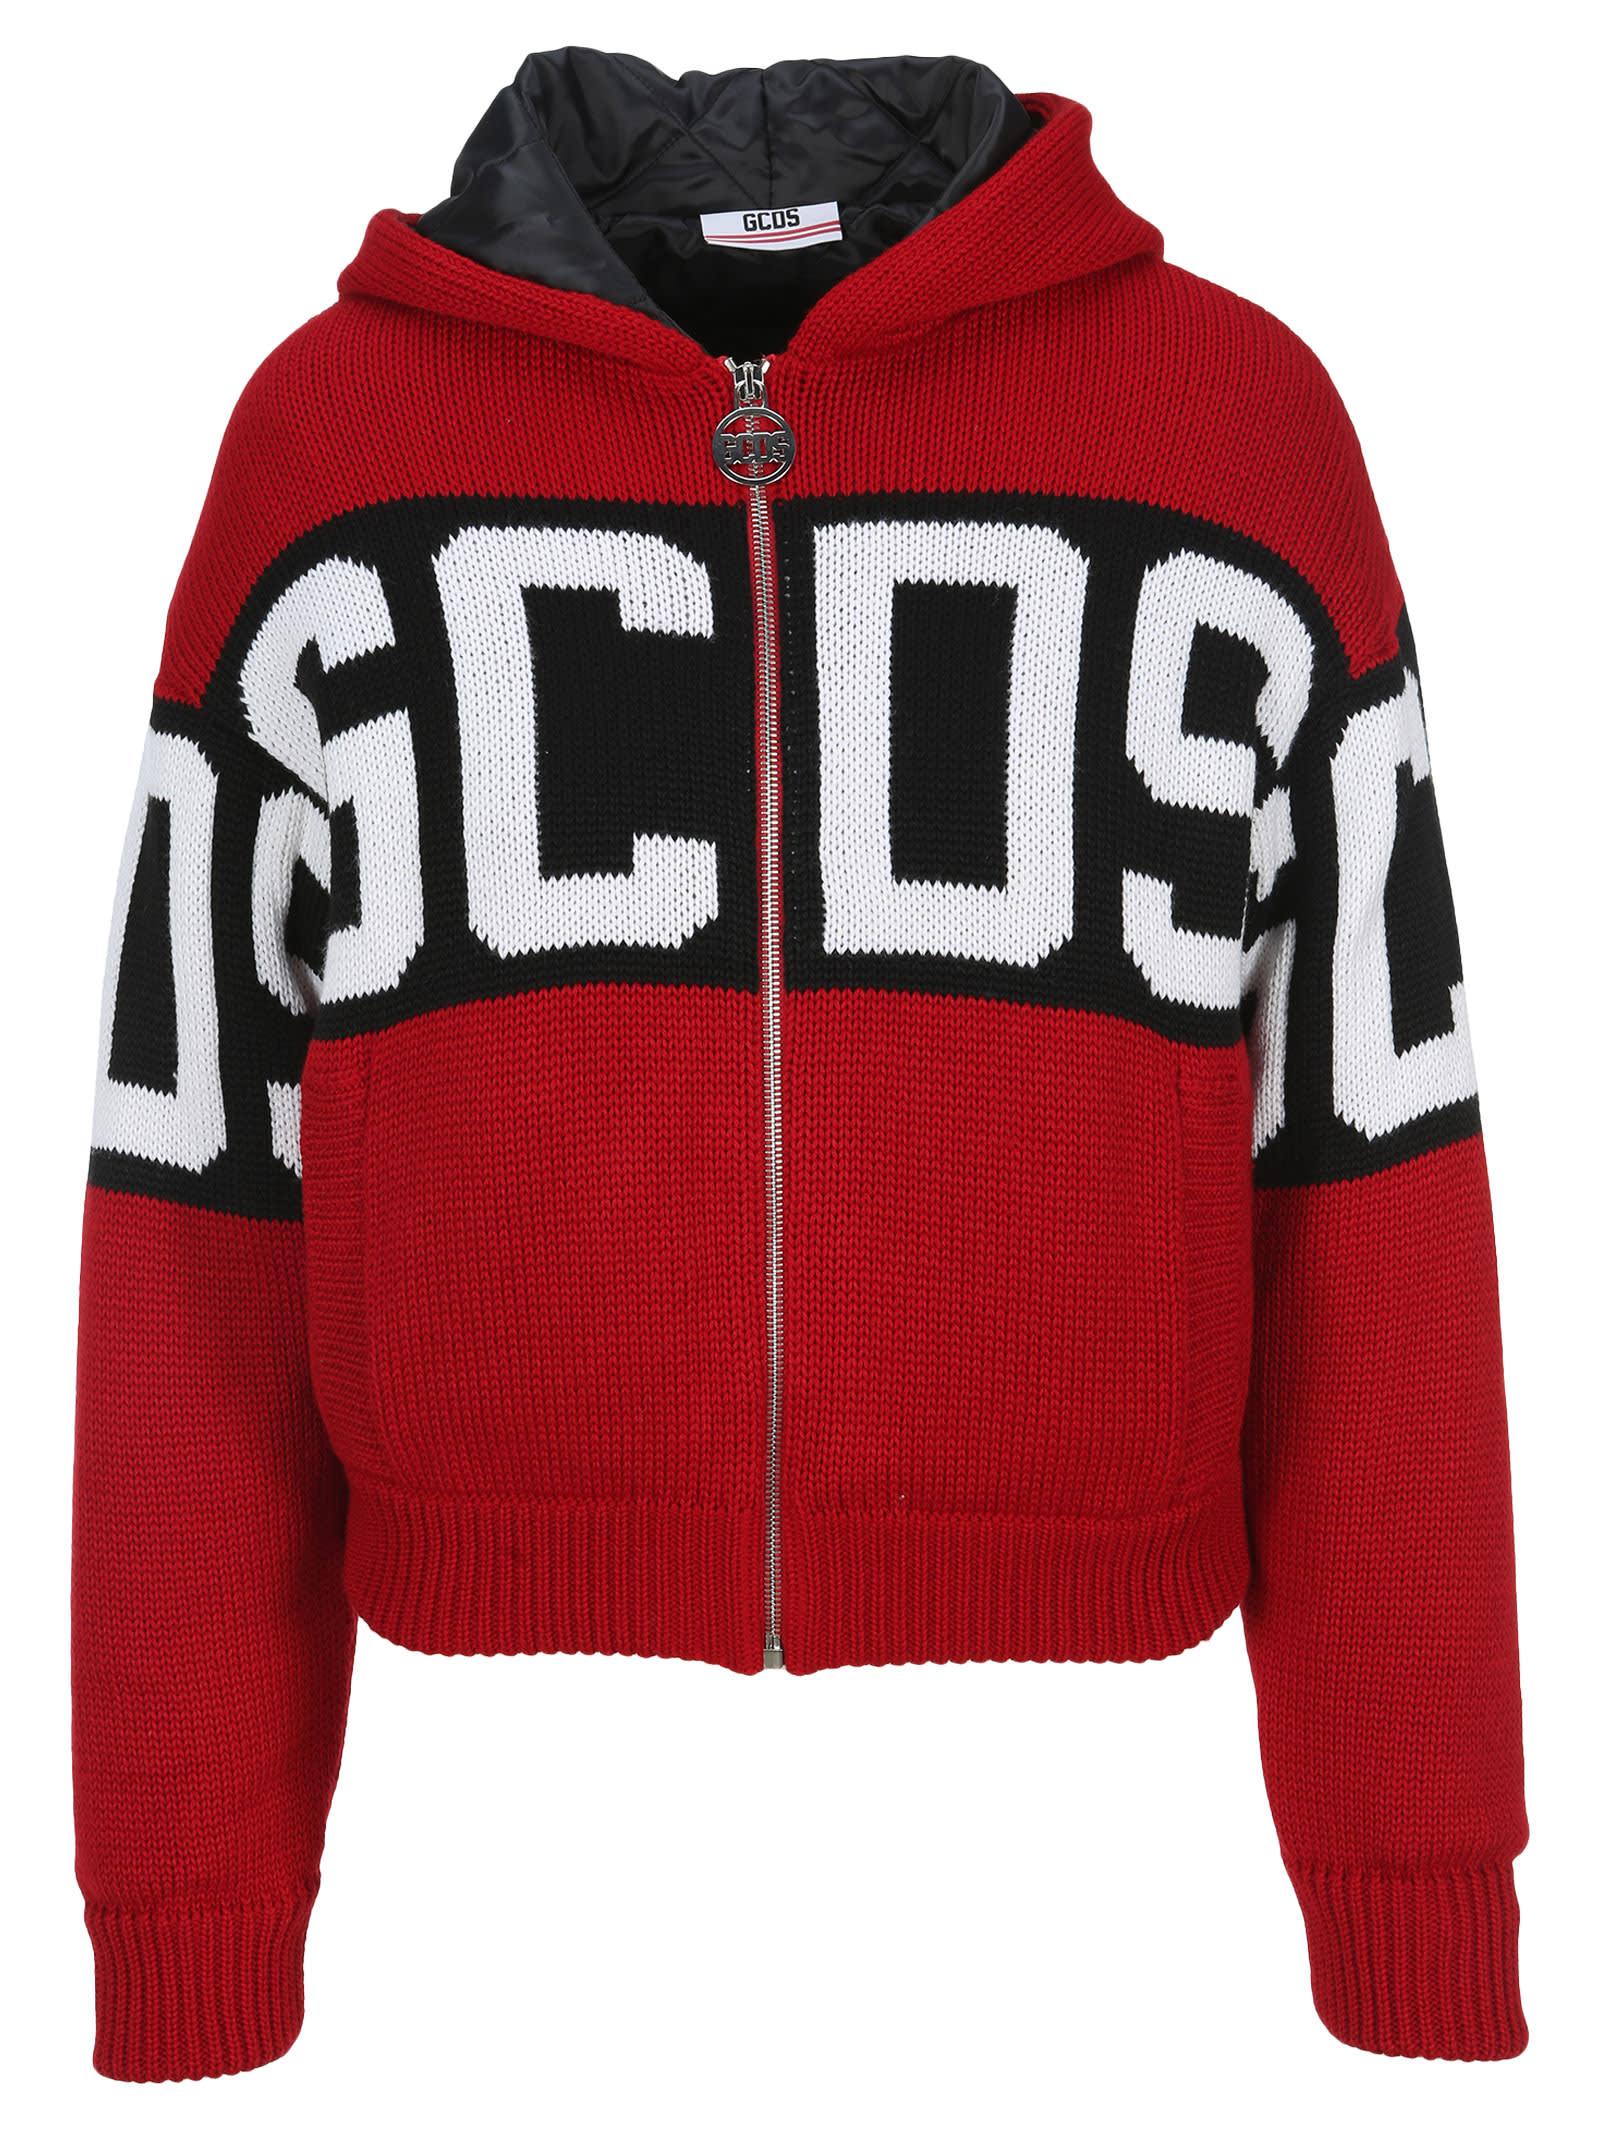 Gcds Knit Padded Jacket